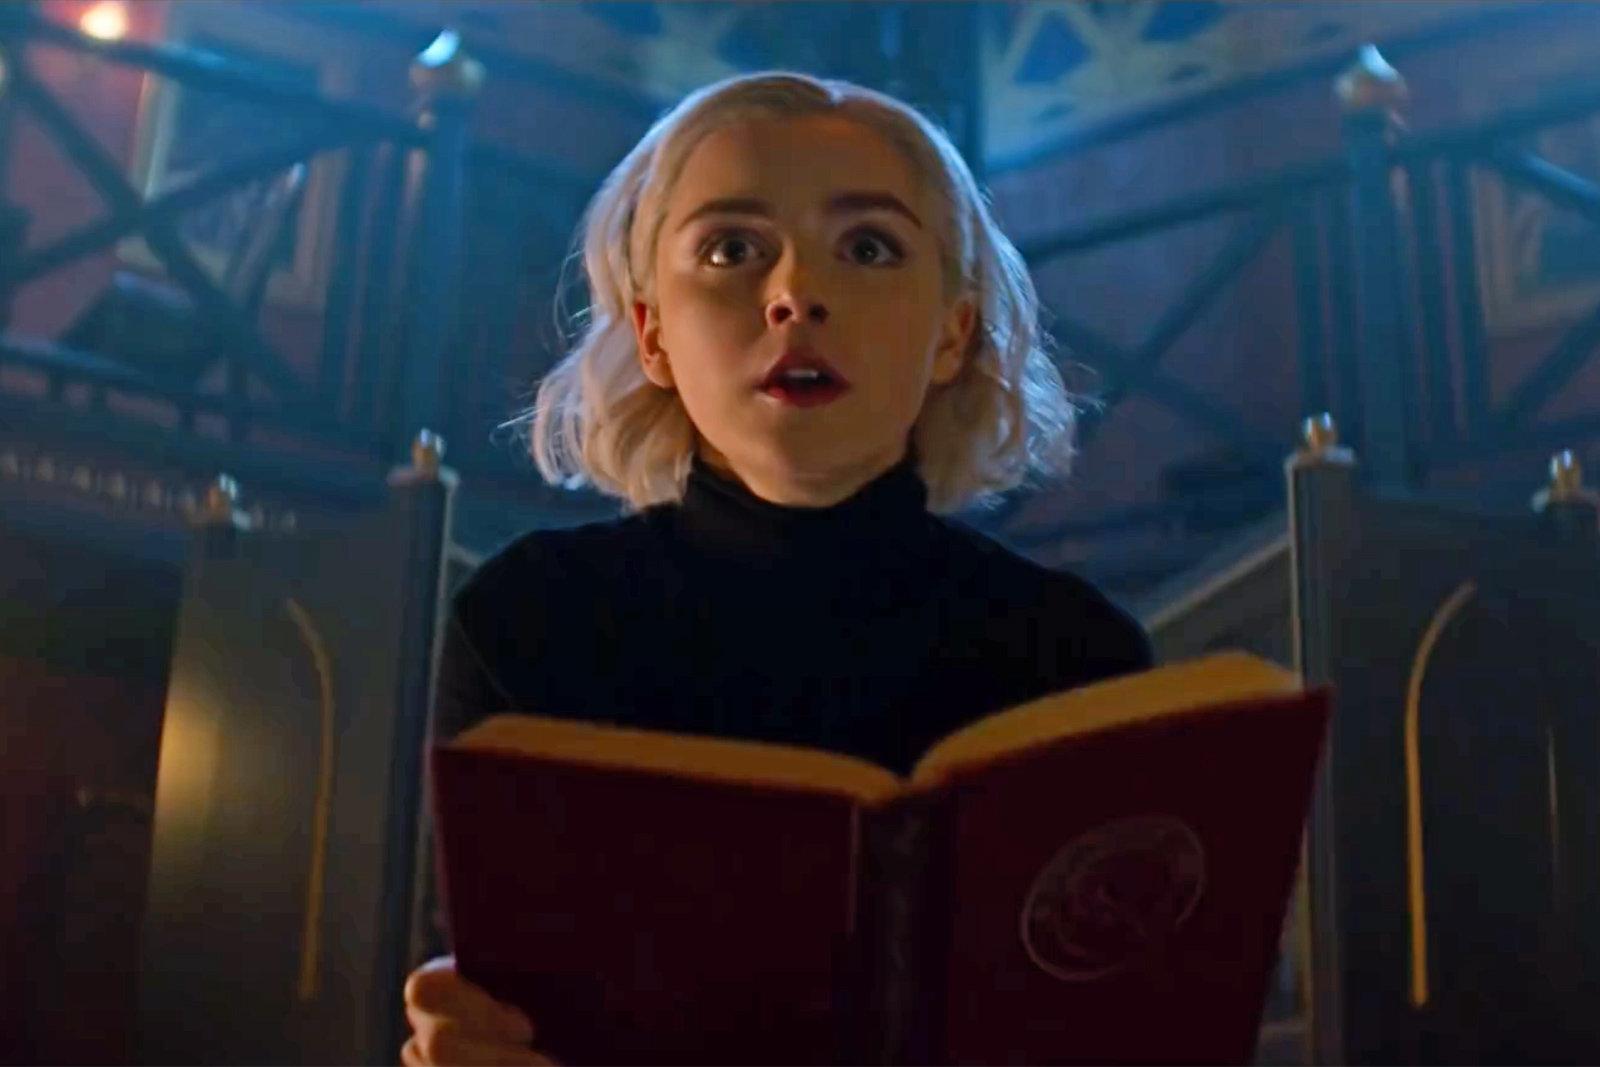 Le Terrificanti Avventure di Sabrina, parte 2: è un successo